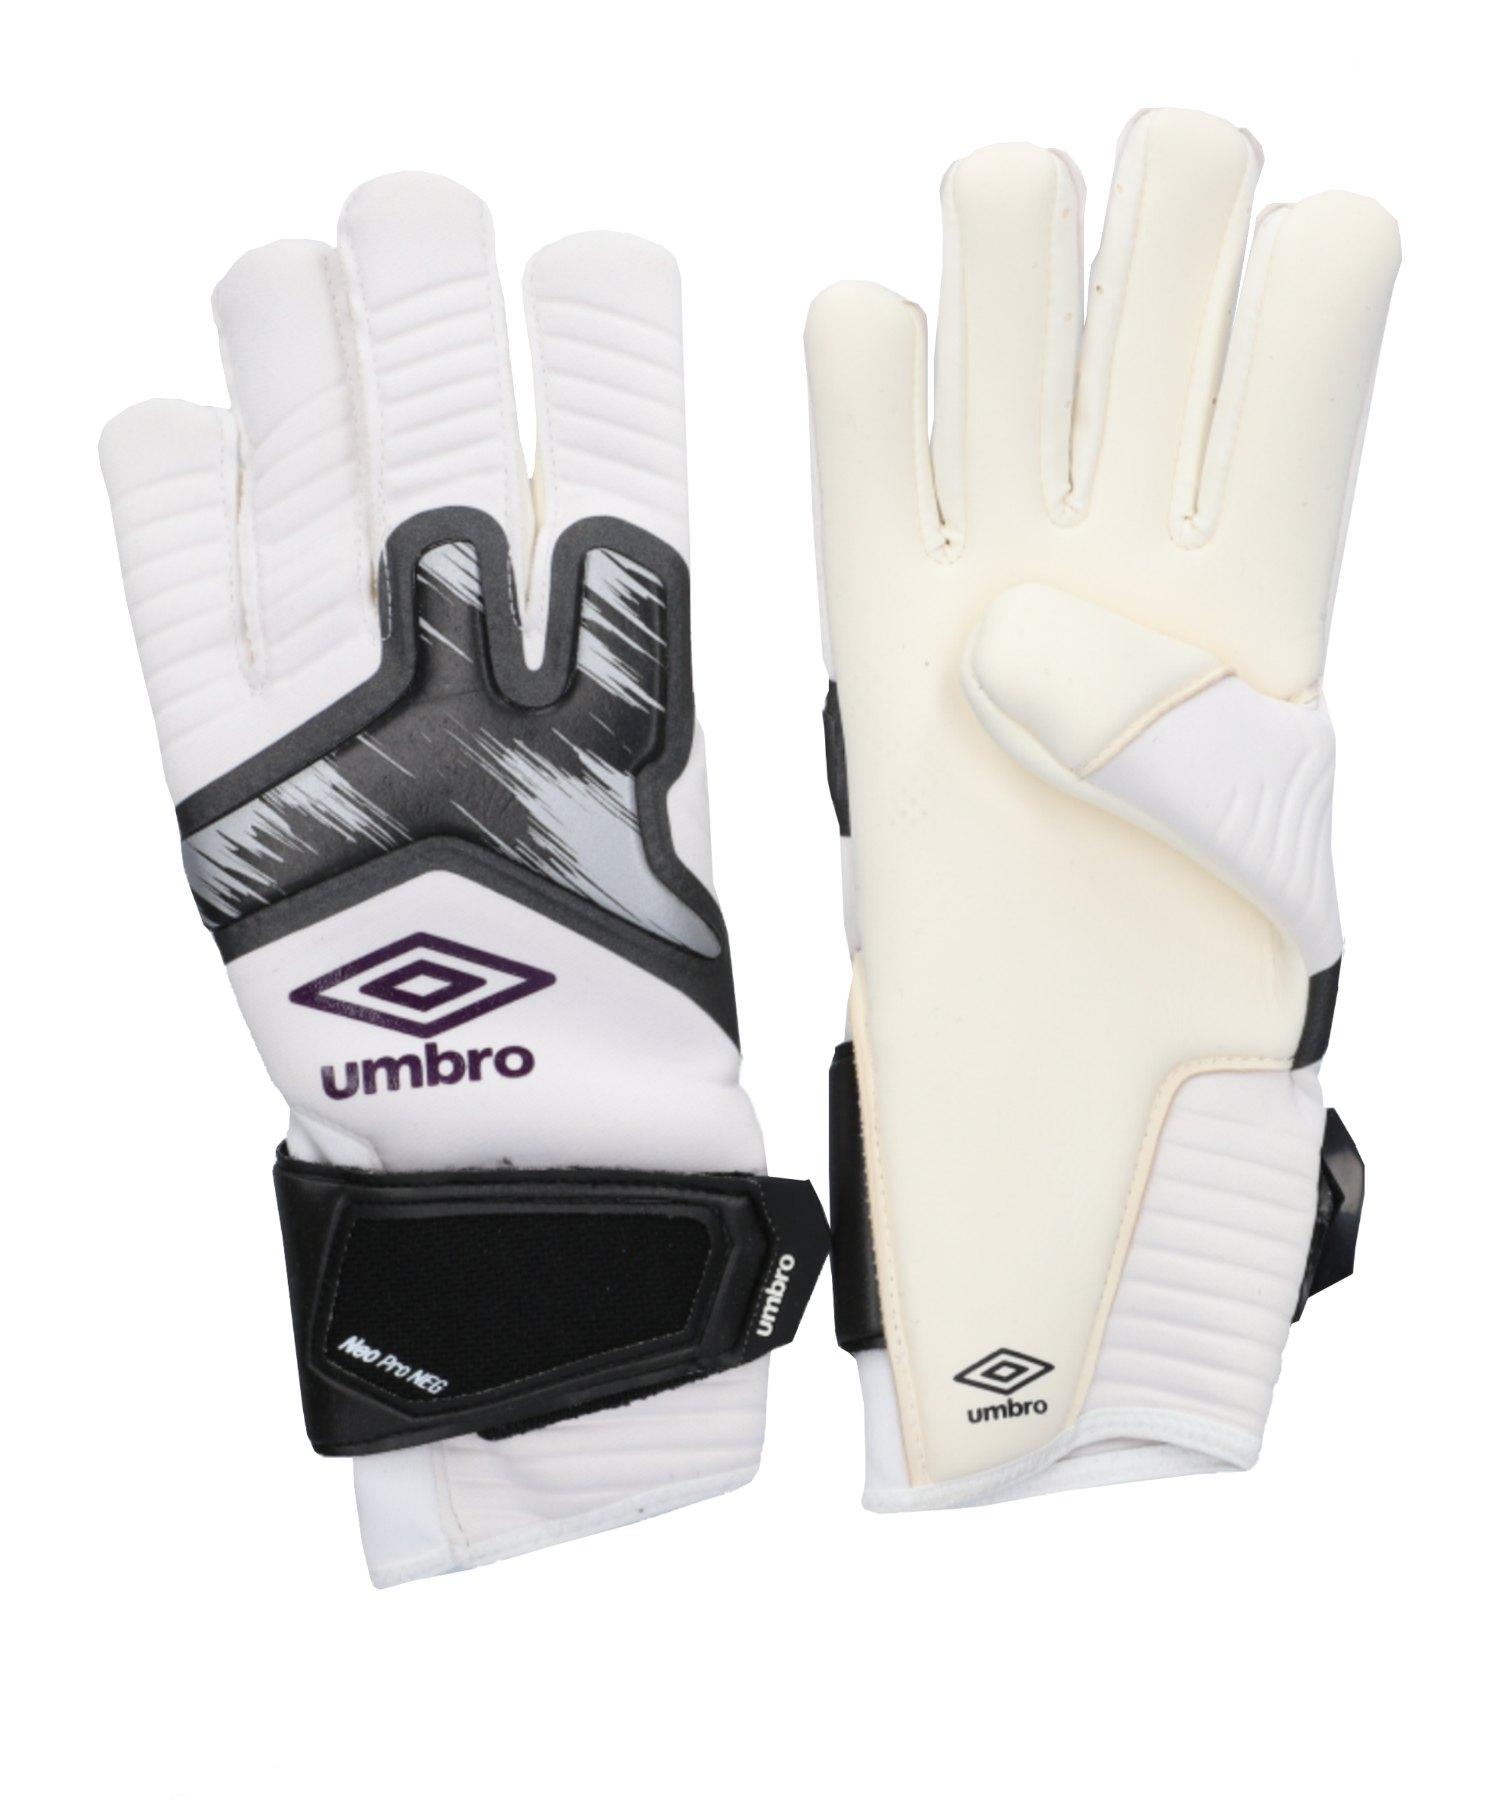 Umbro Neo Pro NC TW-Handschuh Weiss FHPQ - Weiss